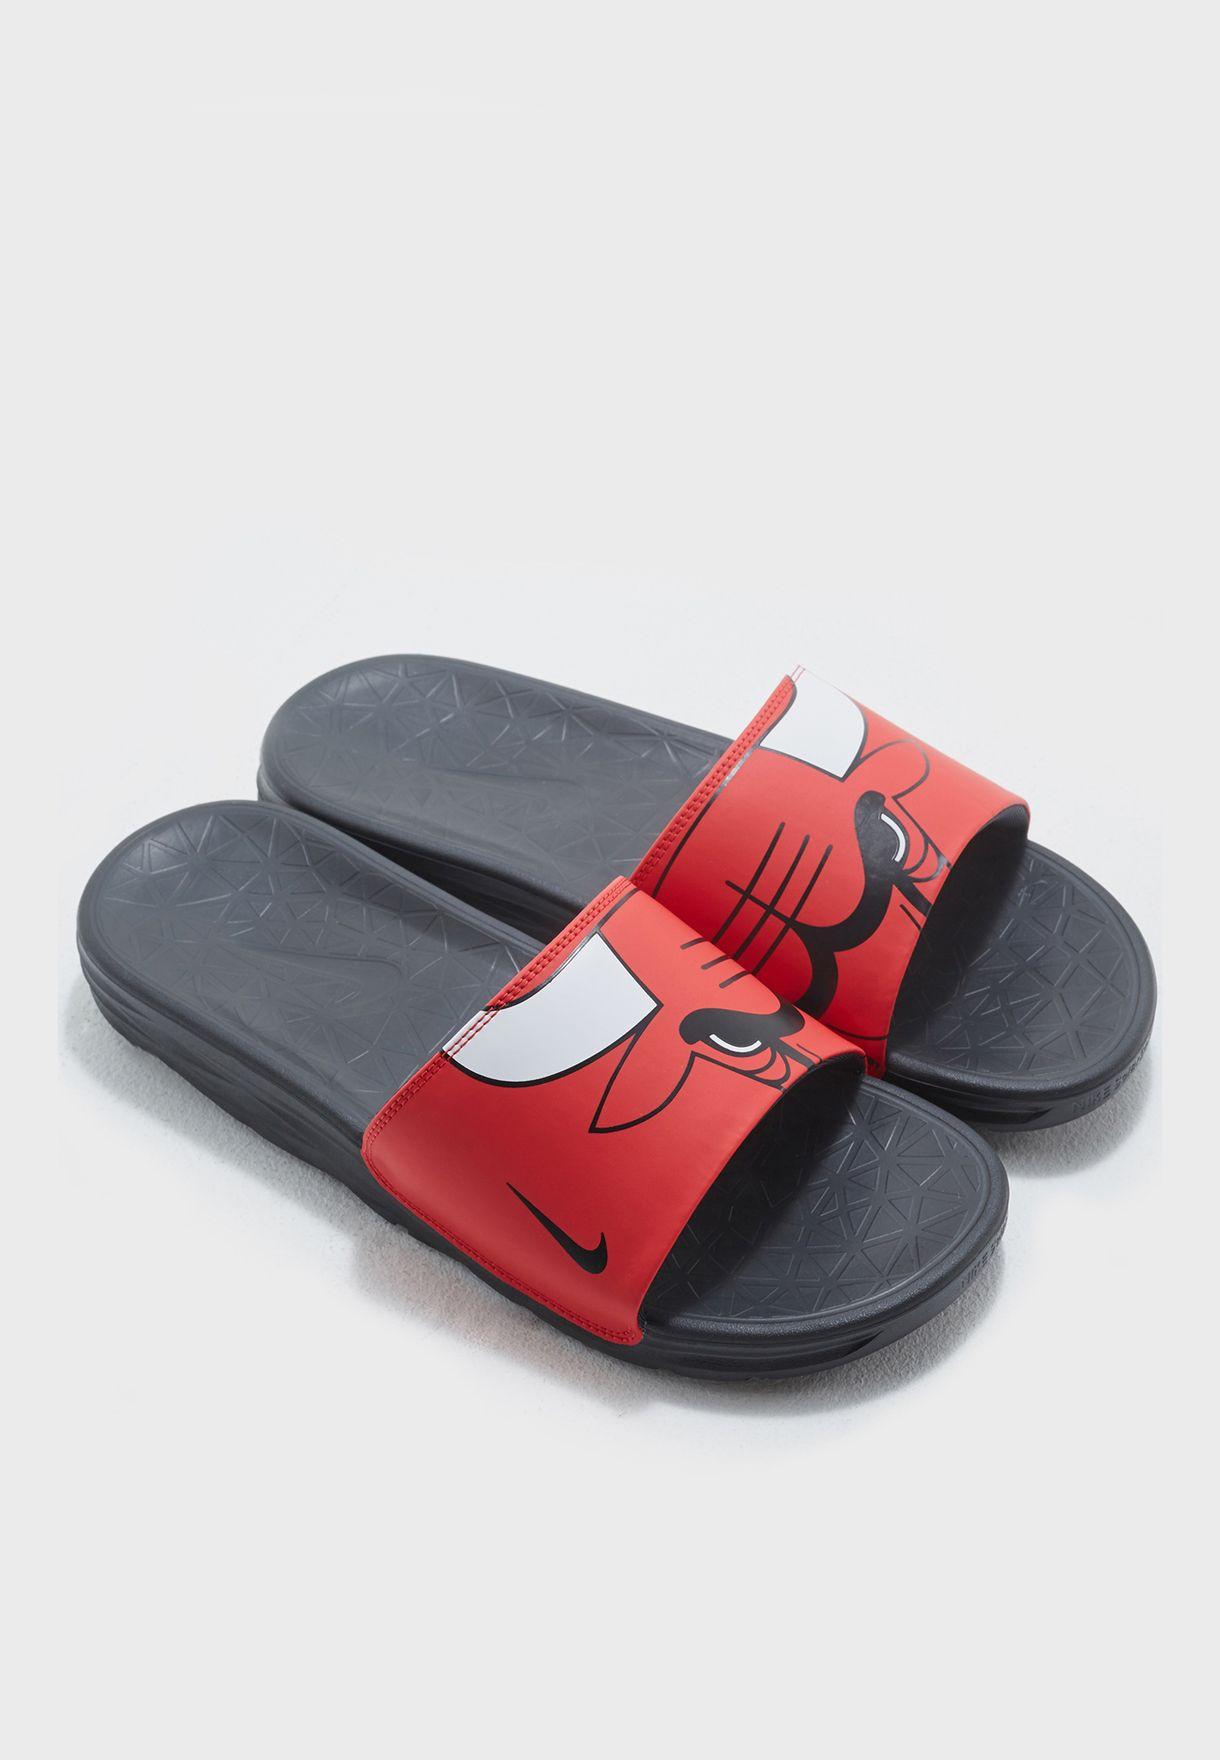 083651241ea4 Shop Nike multicolor Chicago Bulls Benassi Solarsoft 917551-600 for ...